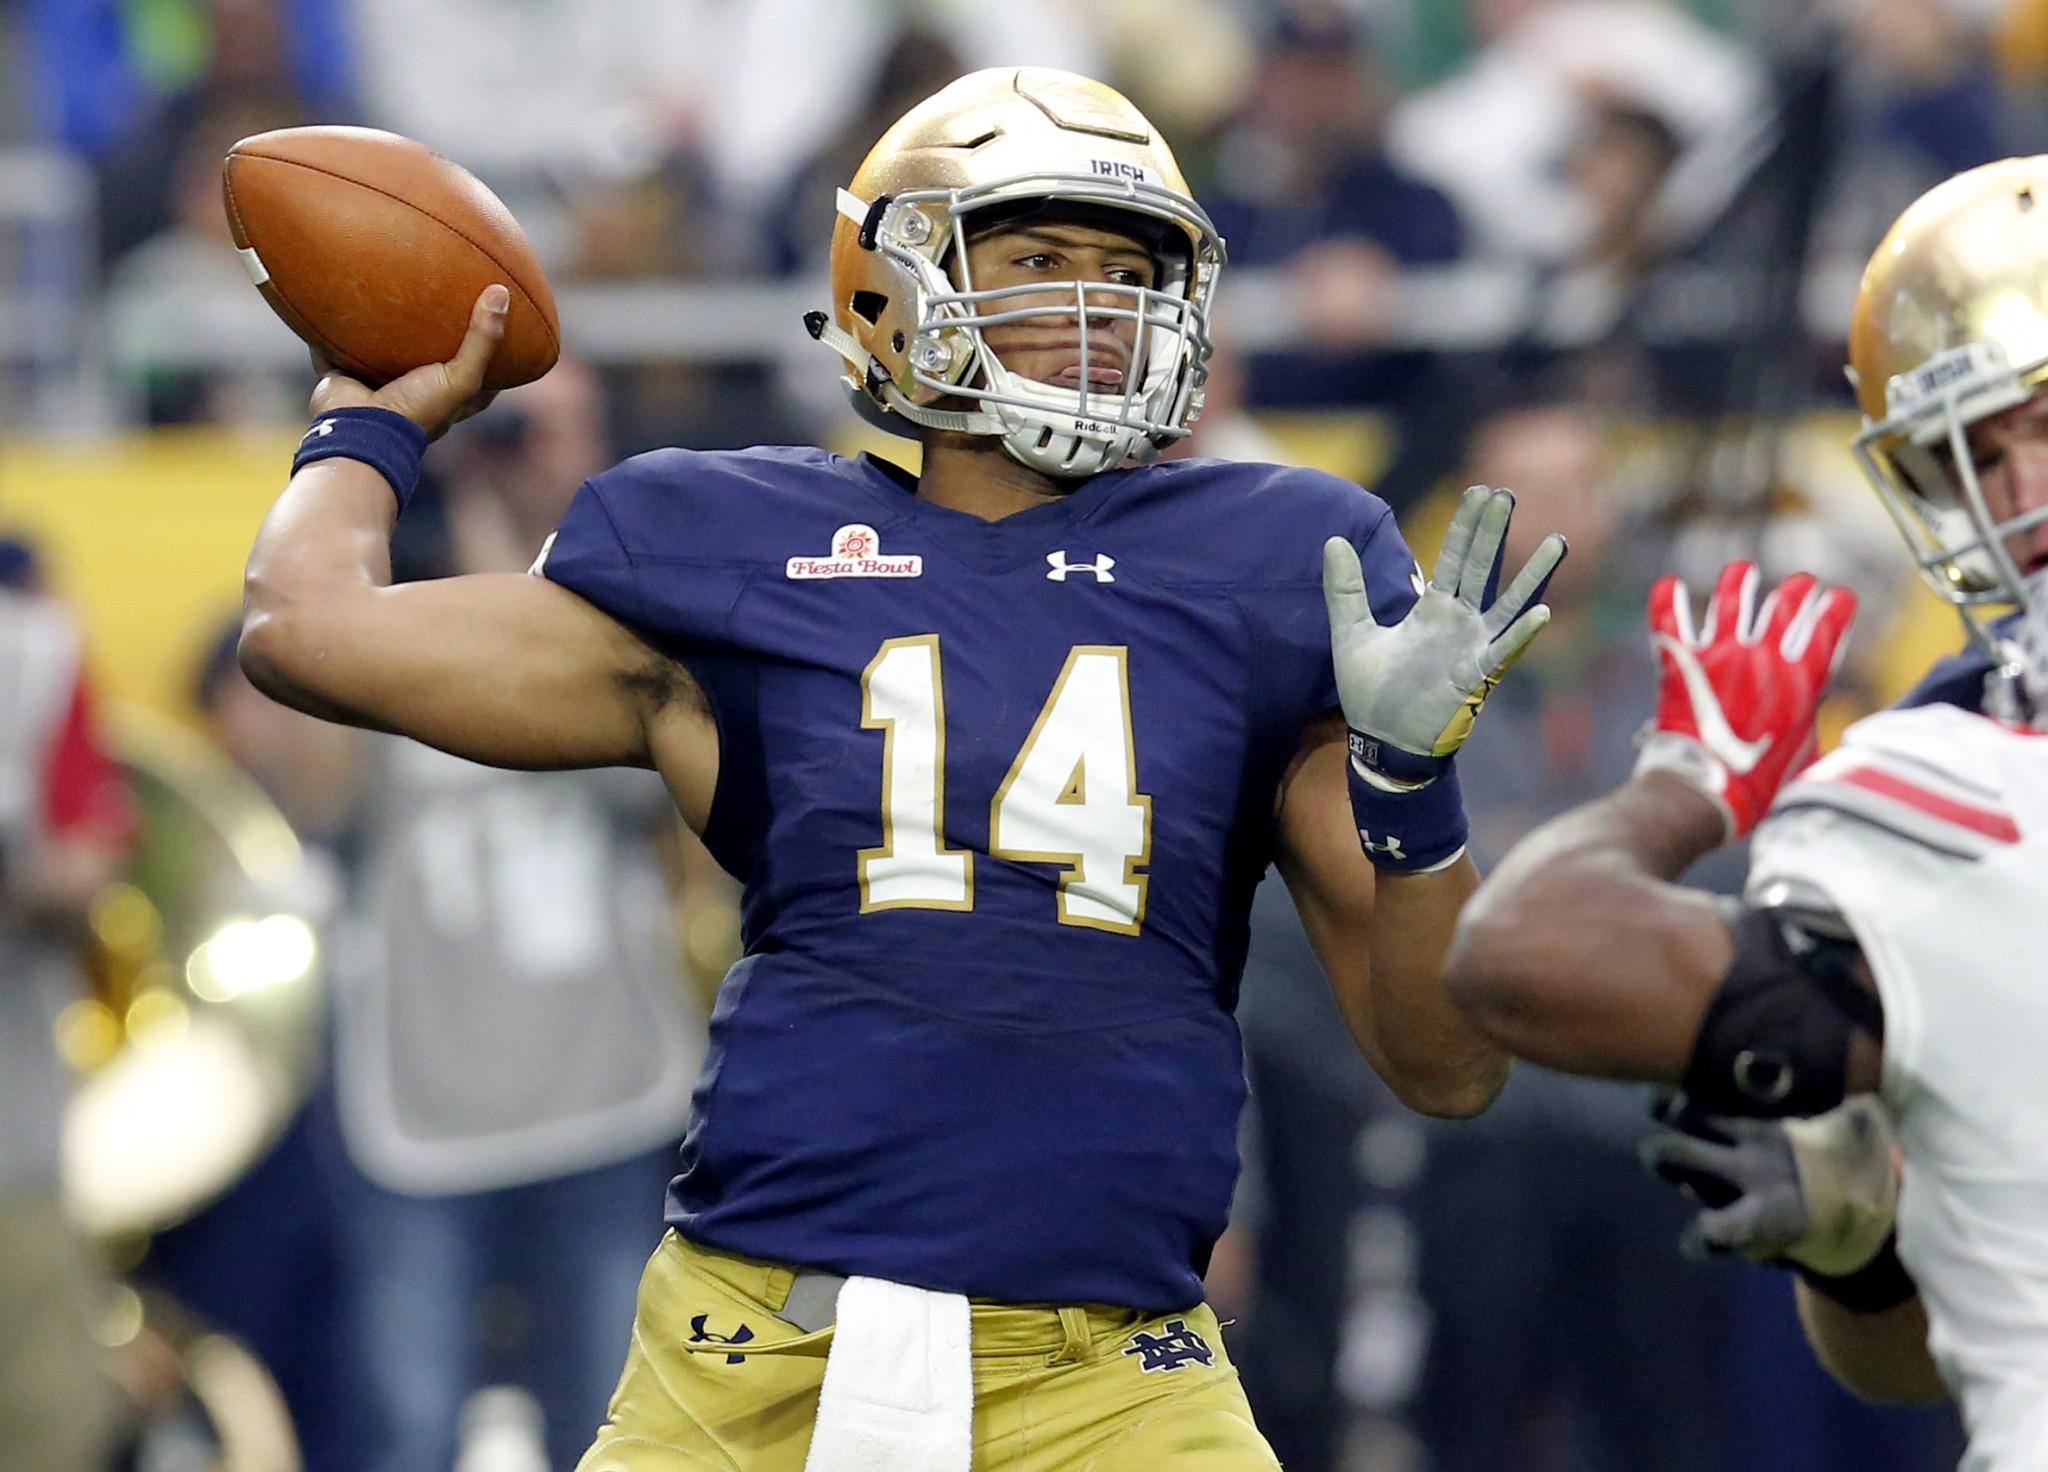 Notre Dame quarterback DeShone Kizer. (AP Photo/Rick Scuteri, File)